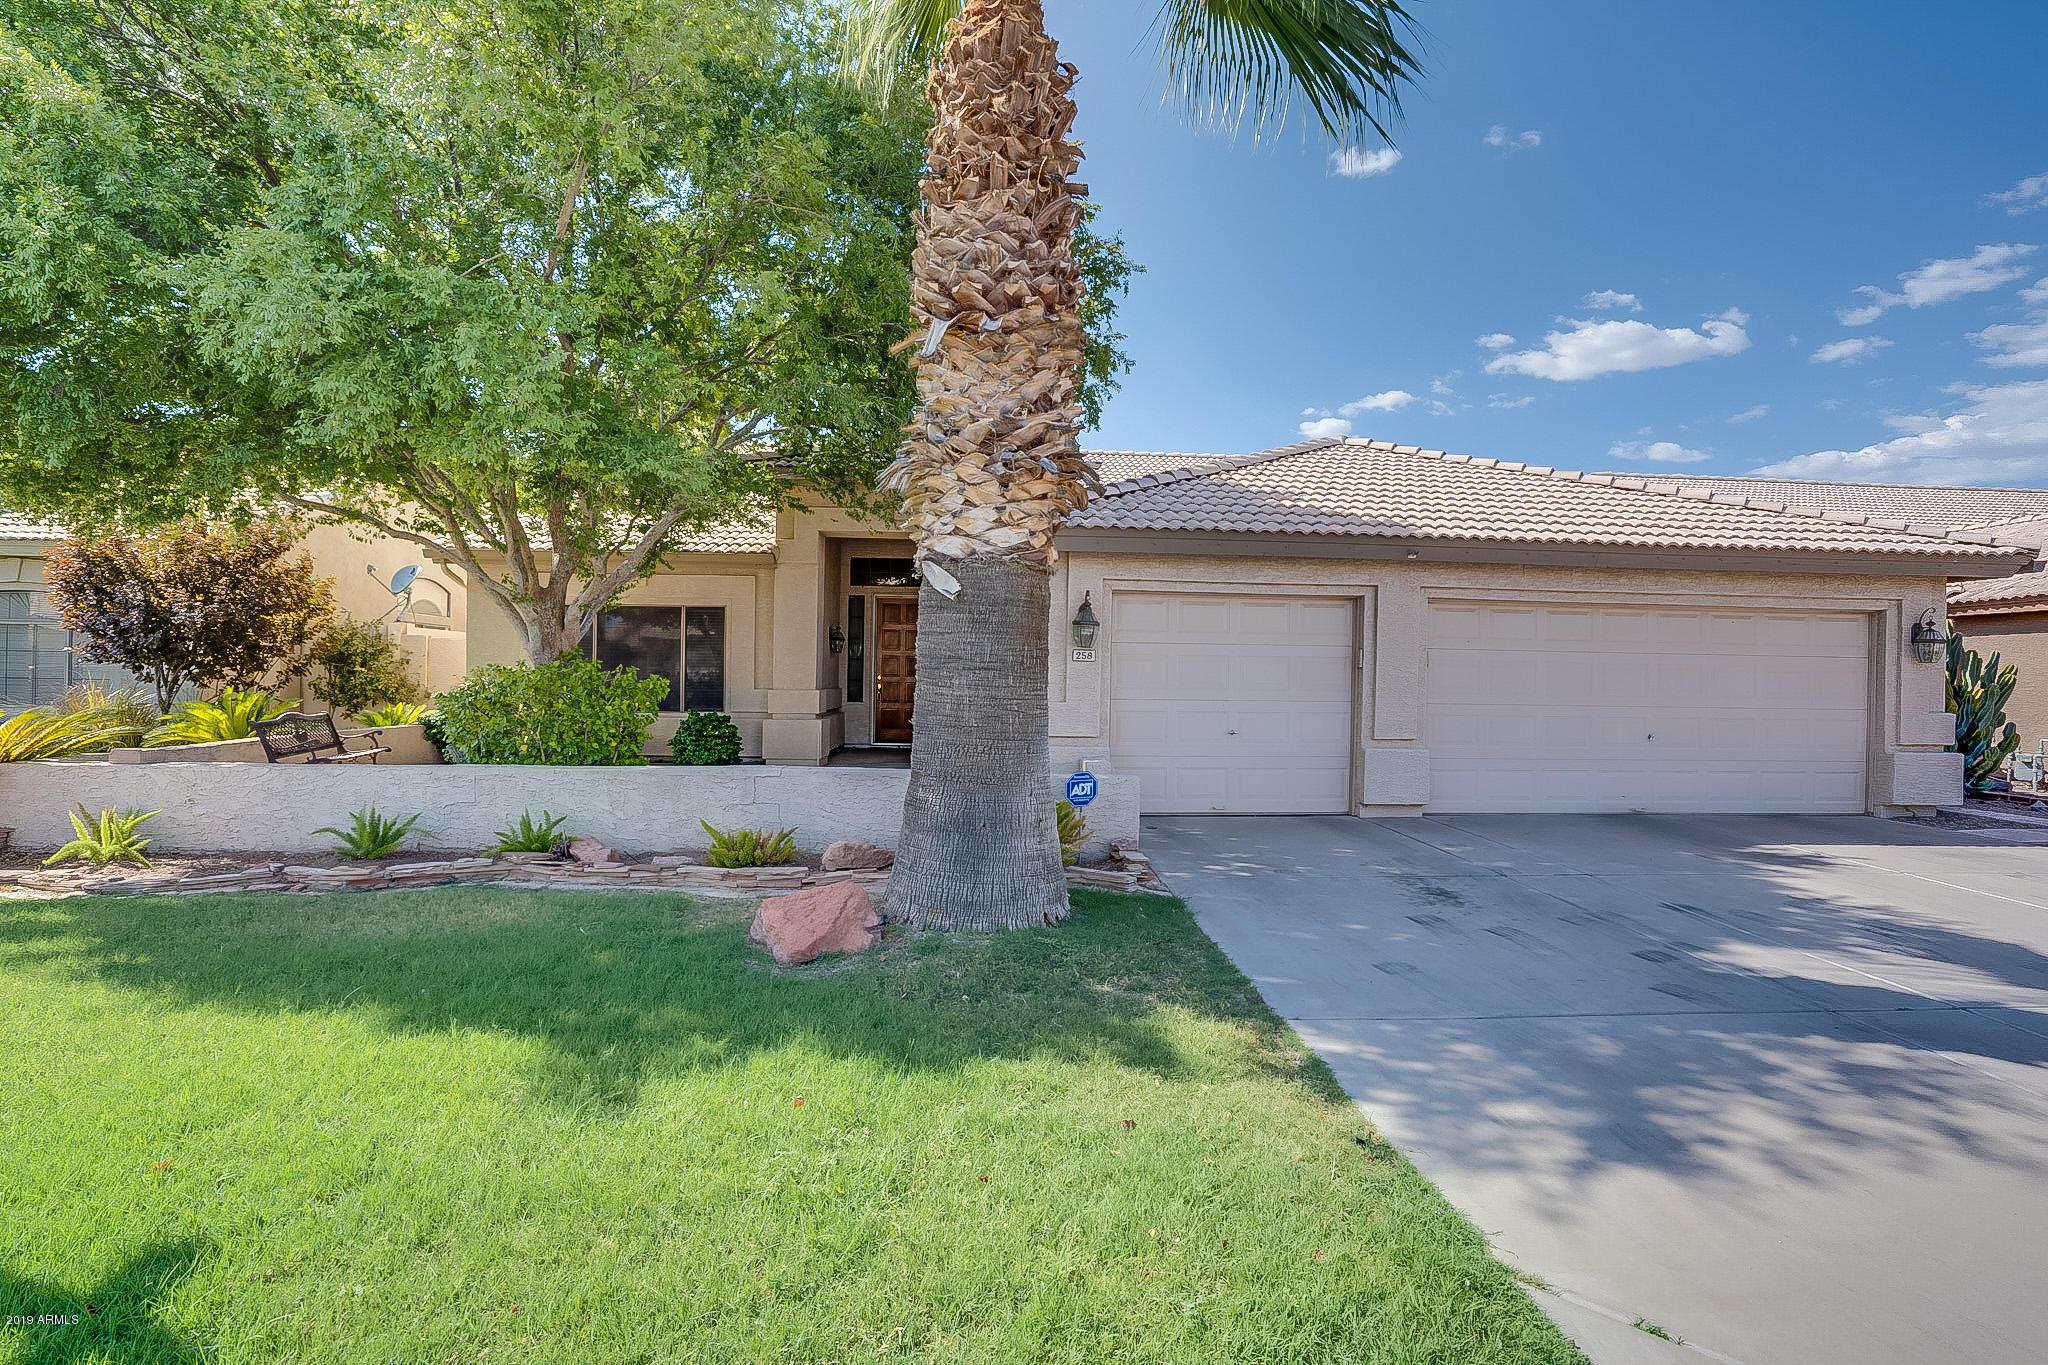 Photo of 258 E SAGEBRUSH Street, Gilbert, AZ 85296